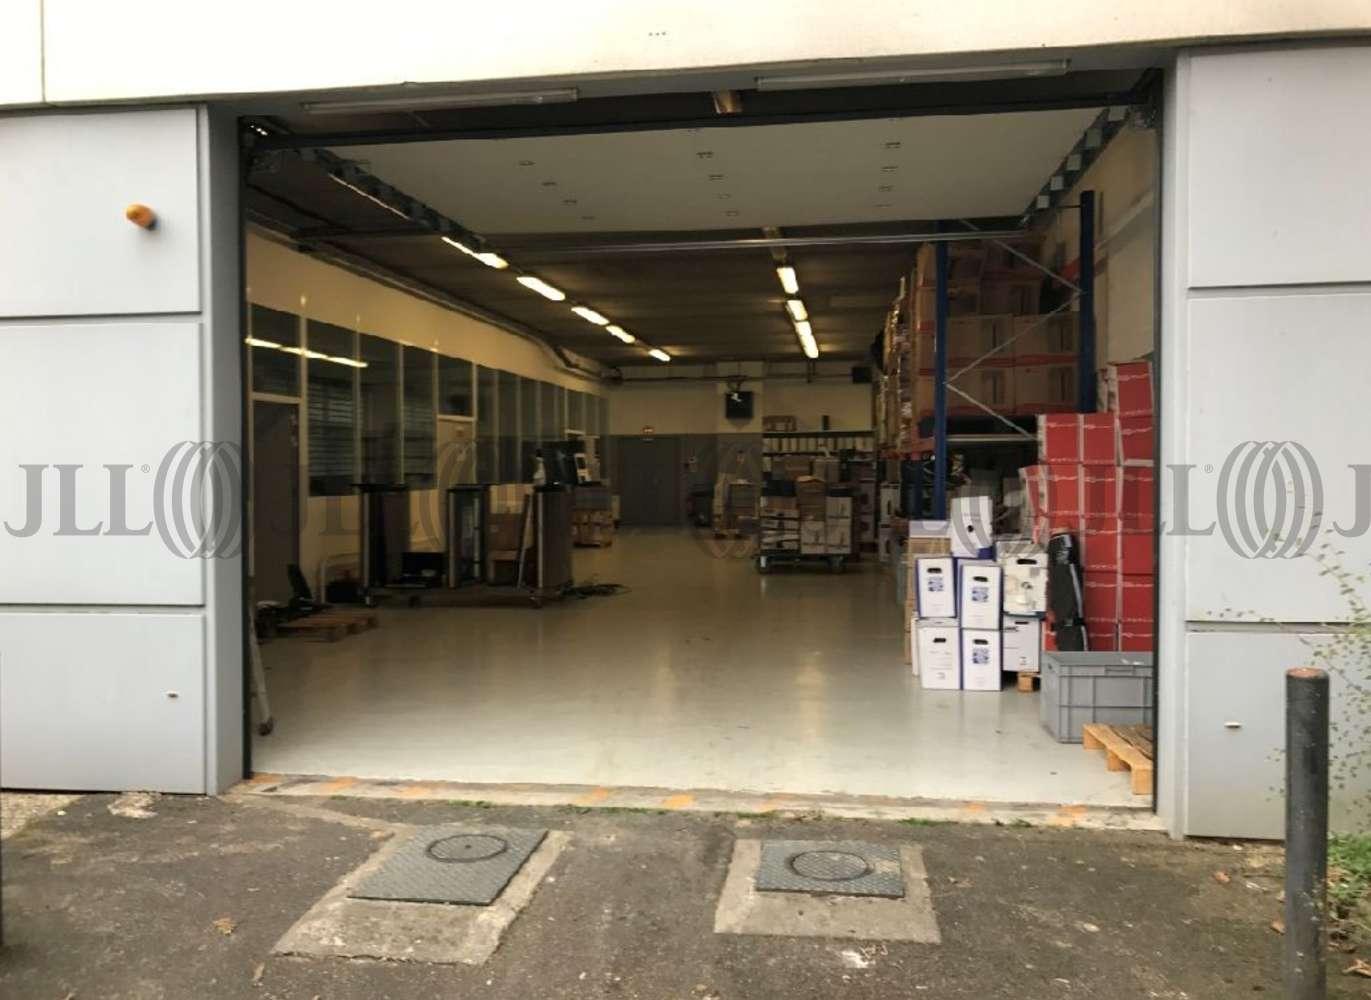 Activités/entrepôt Roissy en france, 95700 - BUSINESS PARK - BAT 6